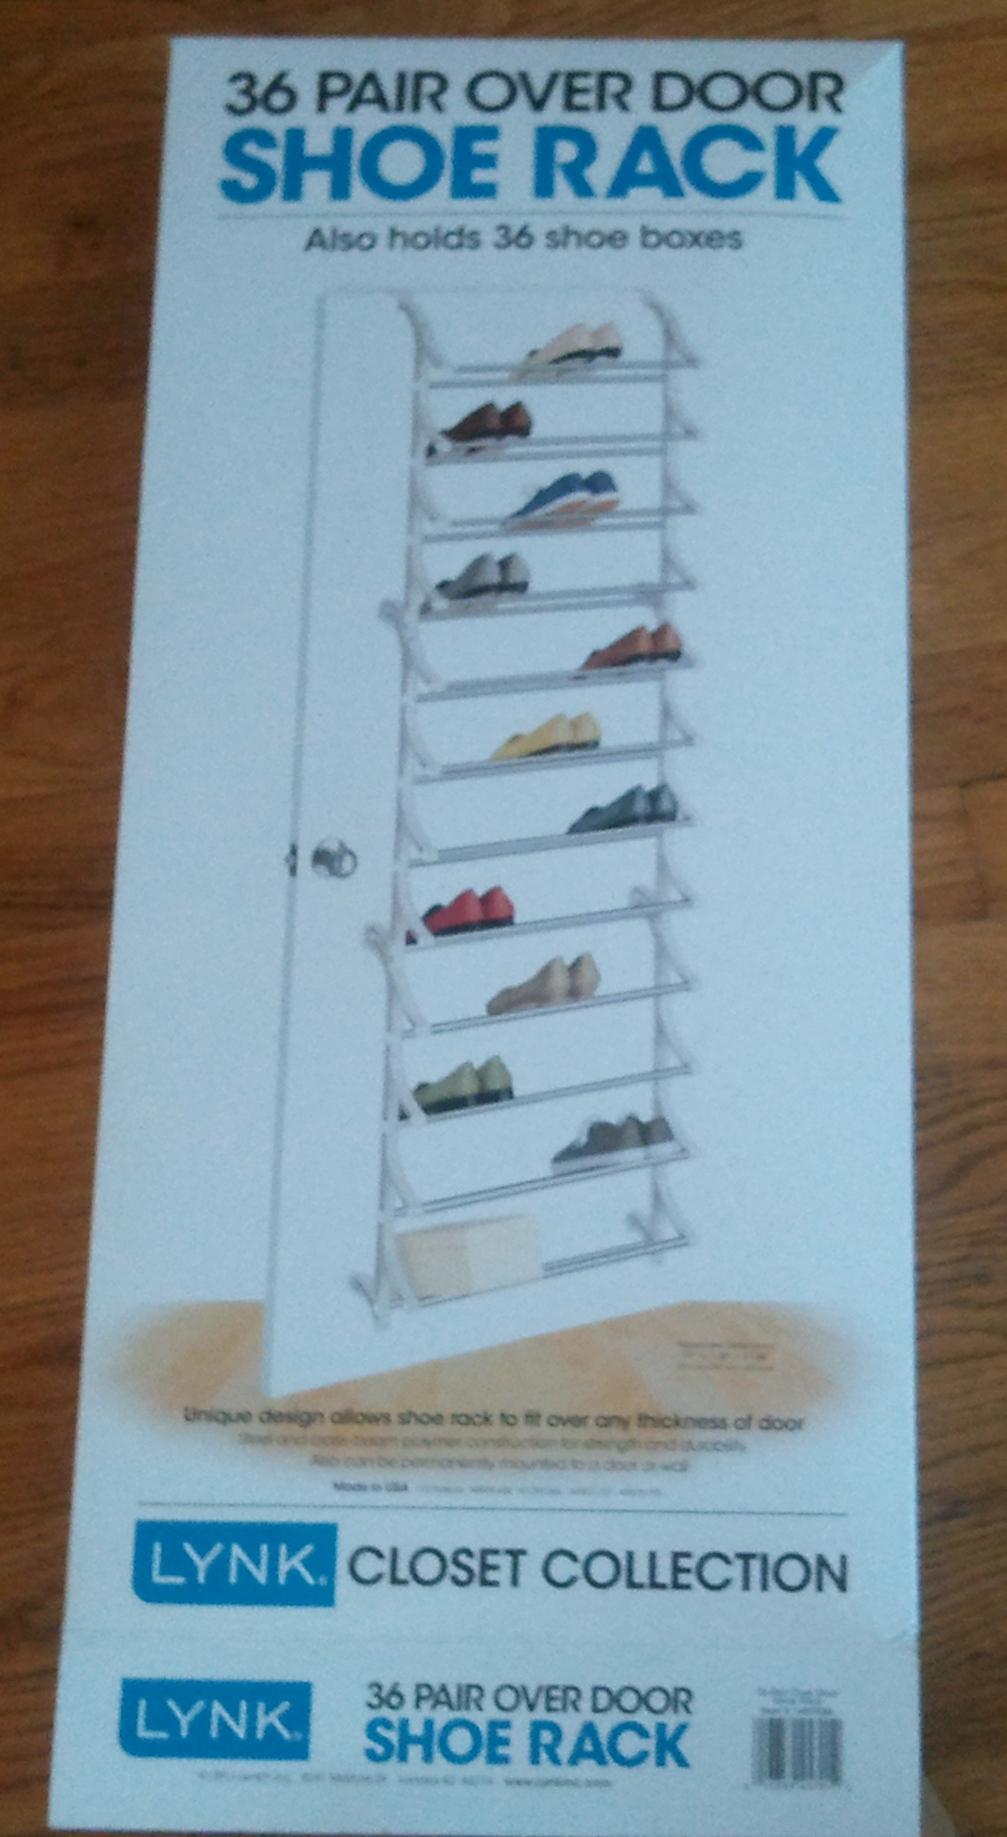 Shoe Rack Project Plans Plans Free Download | royal71lmn